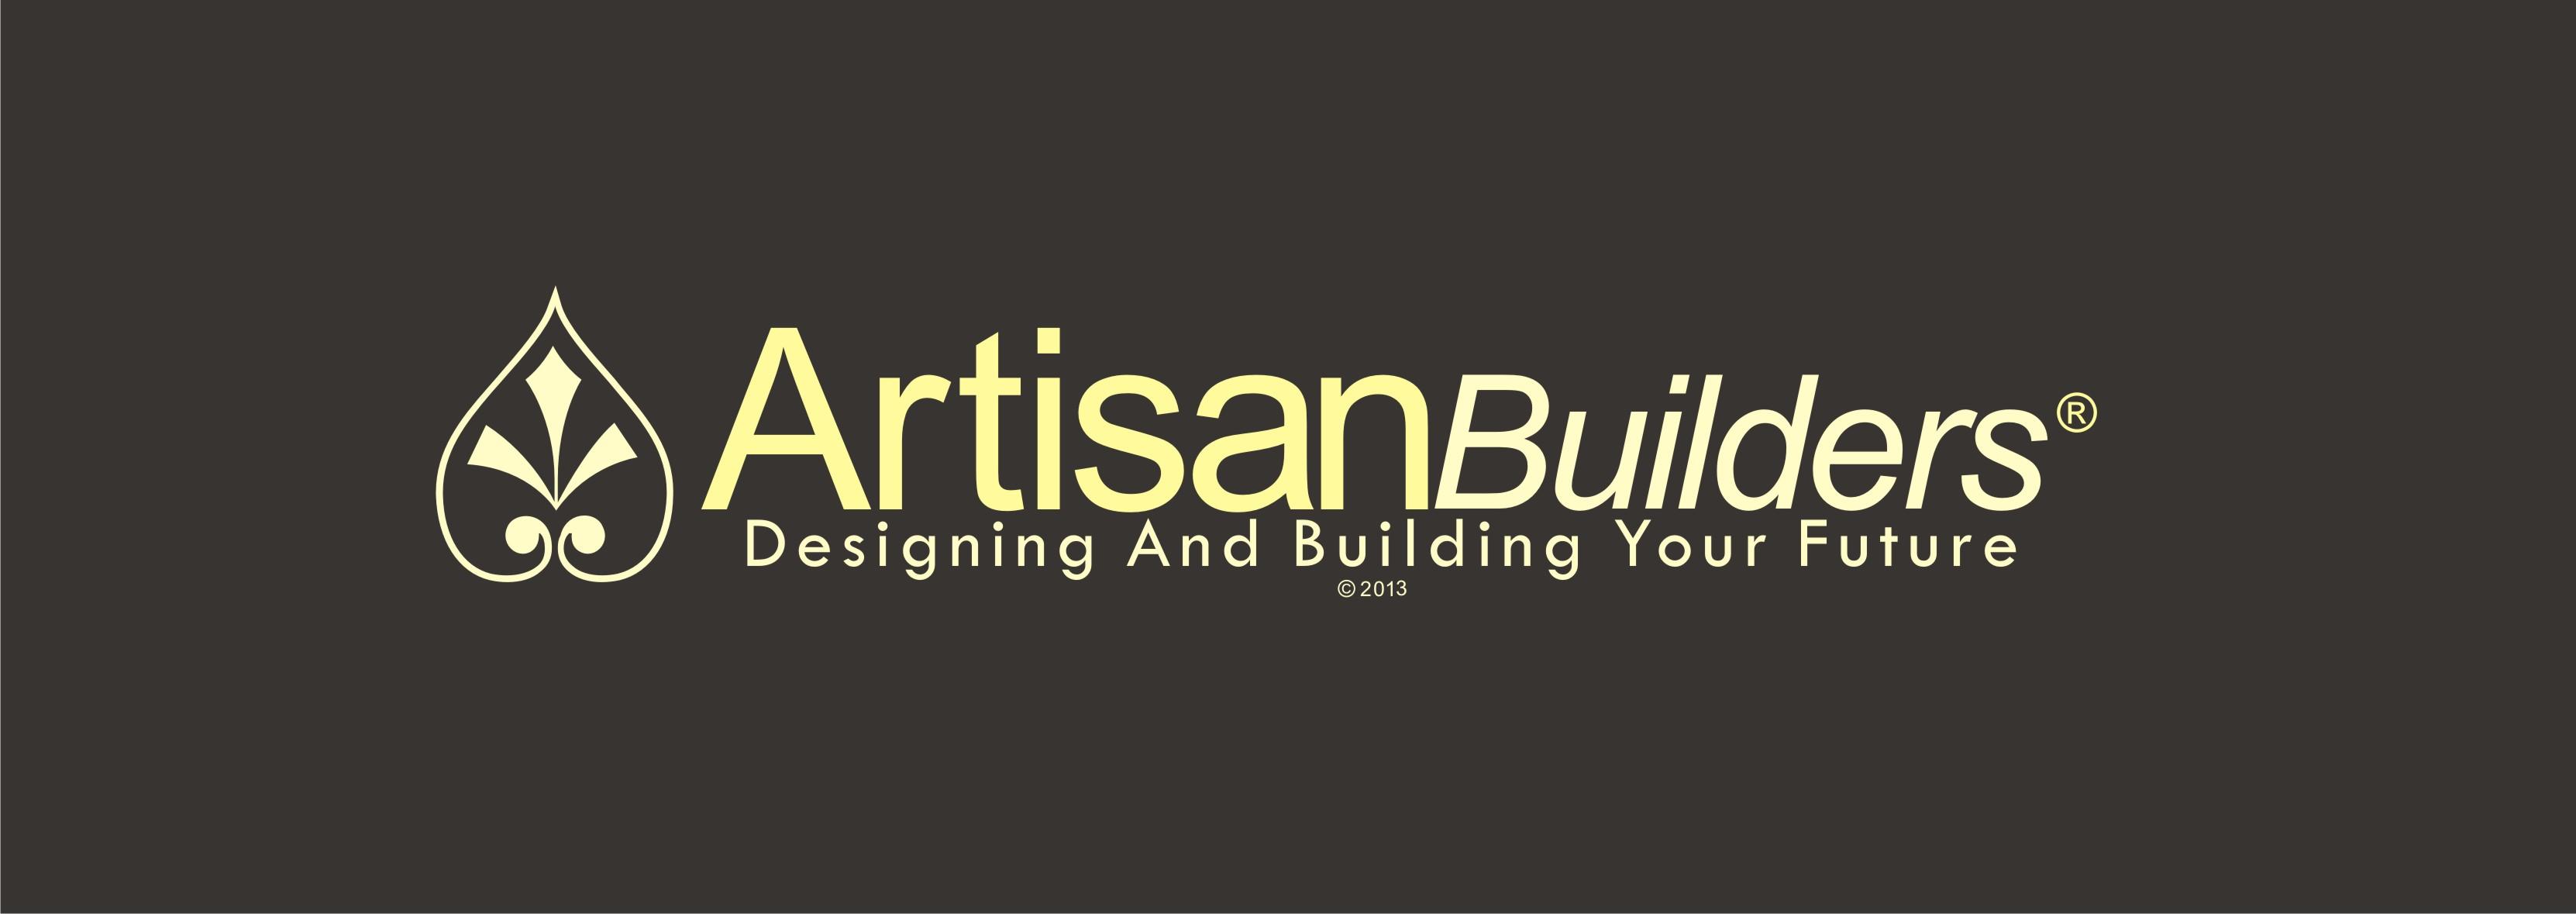 Logo Design by Eic Limber - Entry No. 76 in the Logo Design Contest Captivating Logo Design for Artisan Builders.